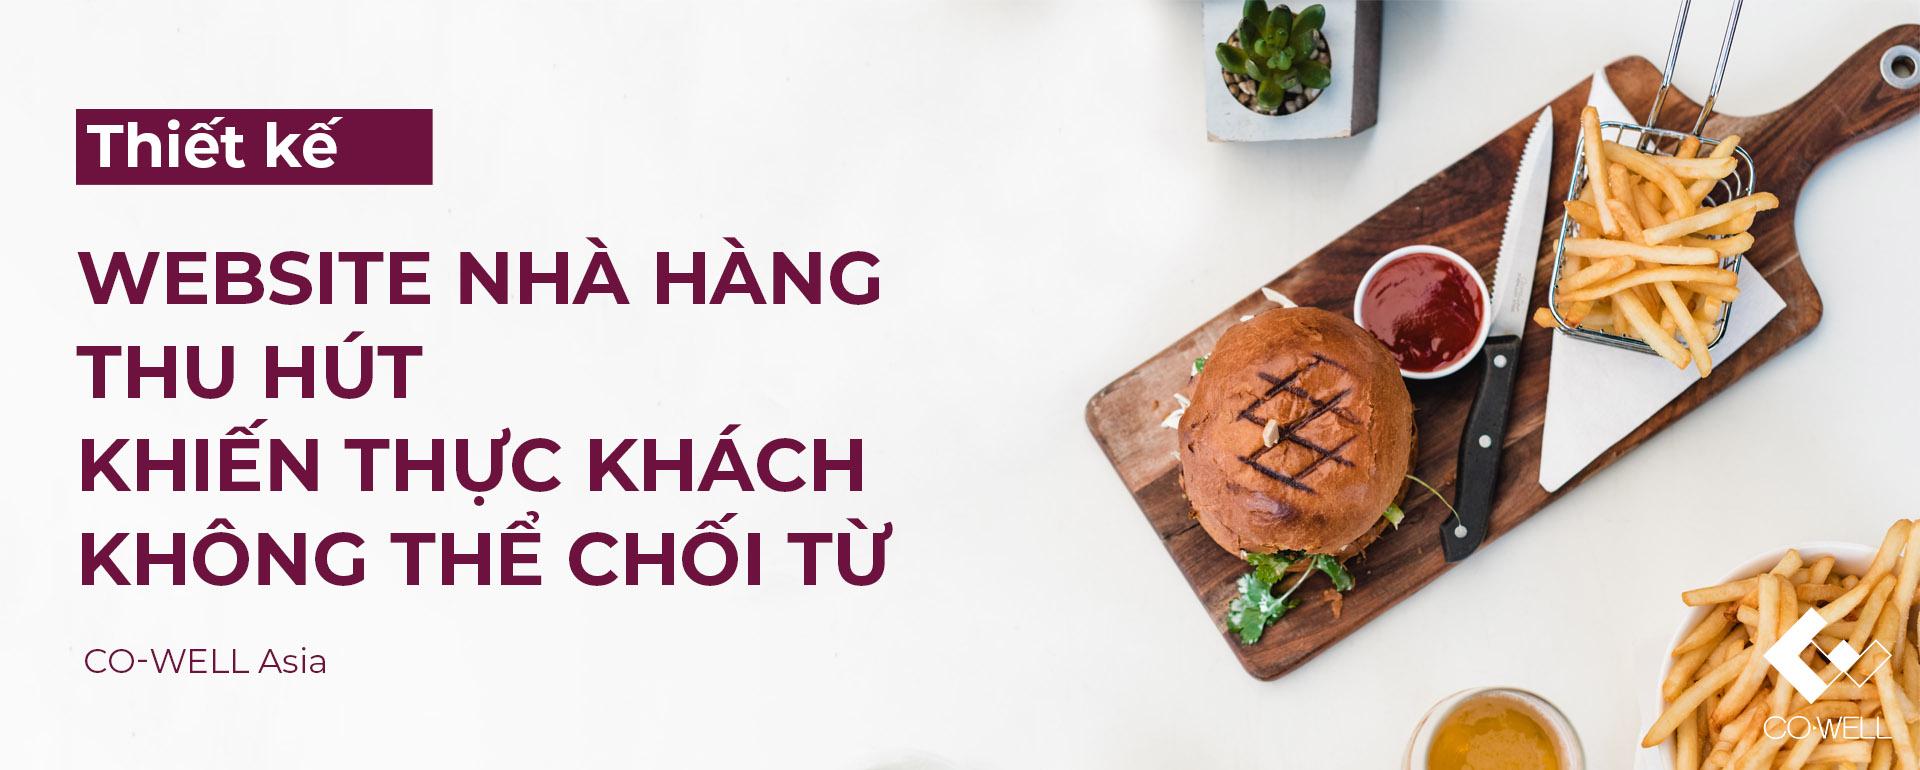 Thiet ke website nha hang thu hut khien thuc khach khong the choi tu Co well ngang